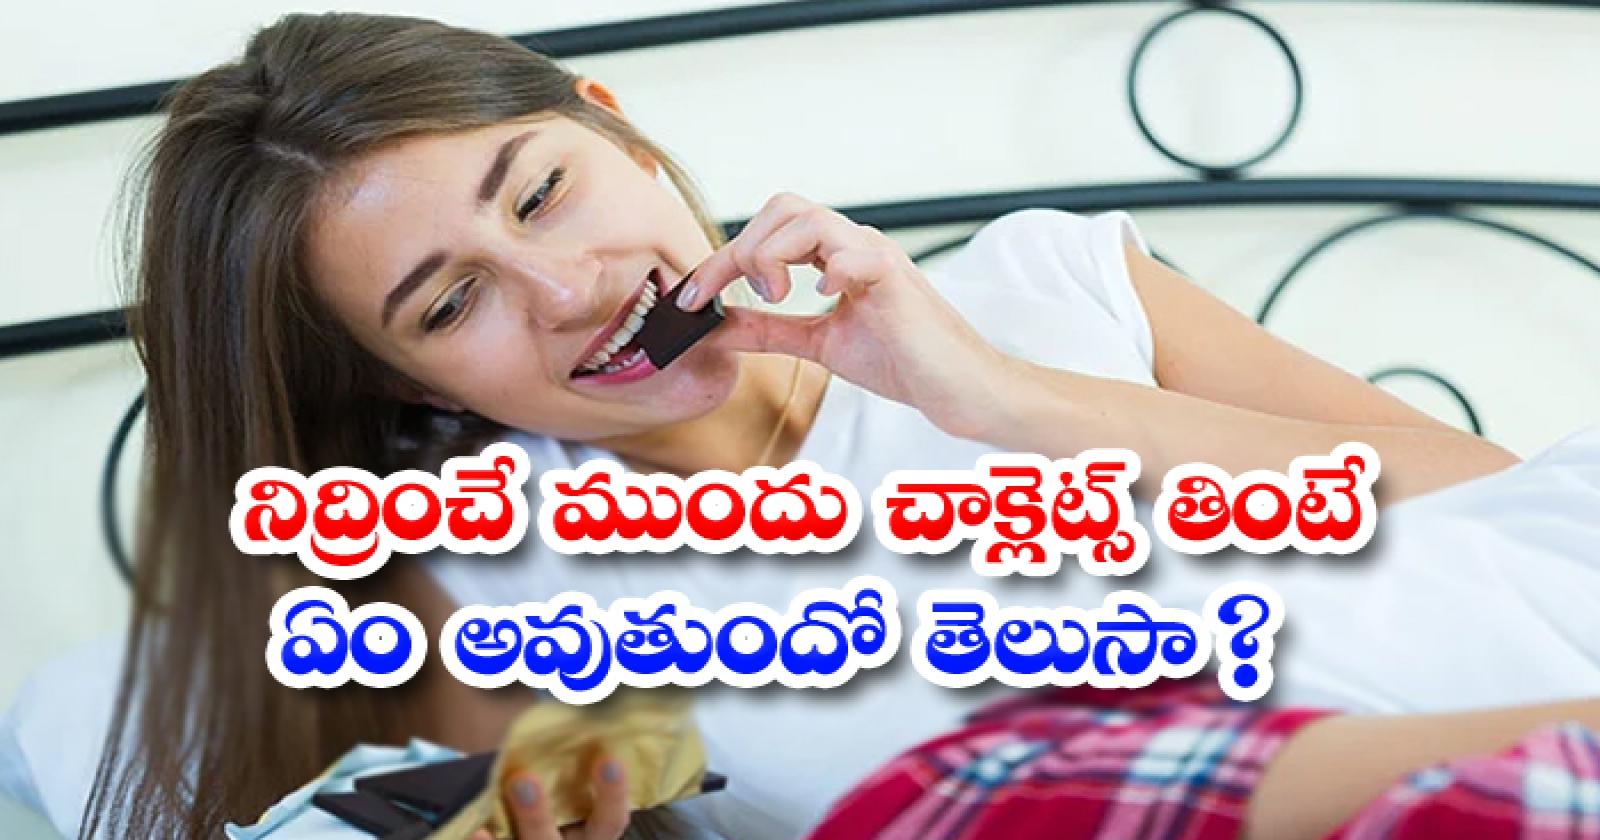 Why Dont Eat Chocolate Before Bed-నిద్రించే ముందు చాక్లెట్స్ తింటే ఏం అవుతుందో తెలుసా-Latest News - Telugu-Telugu Tollywood Photo Image-TeluguStop.com